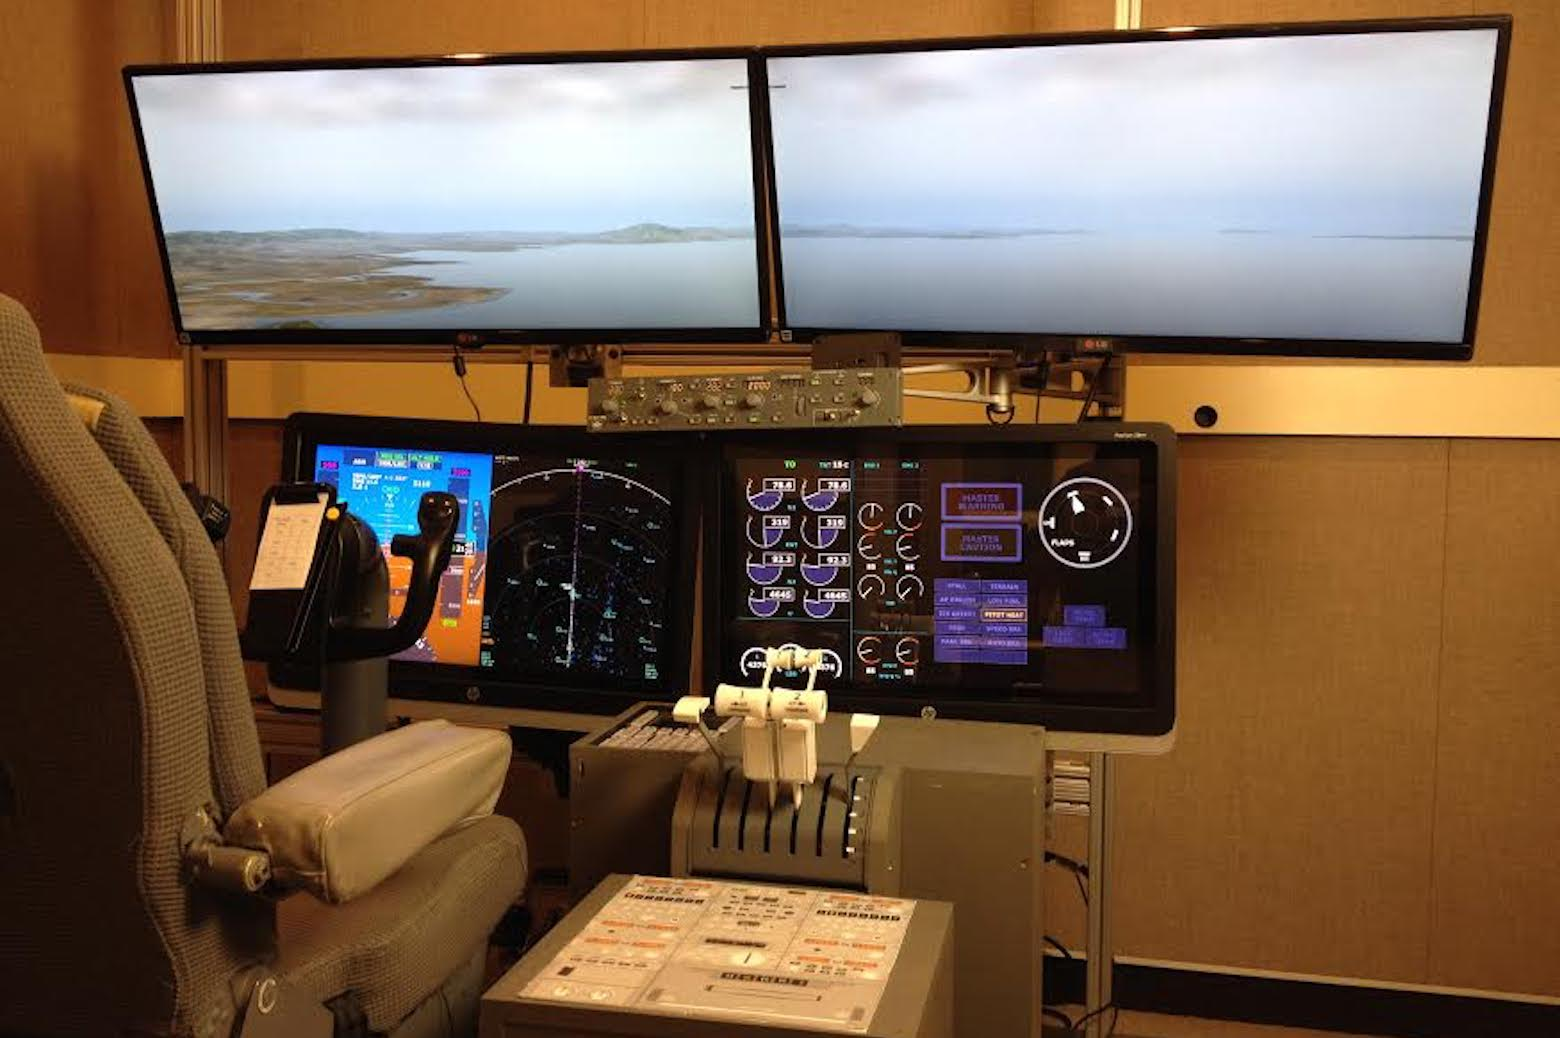 A flight simulator in the lab